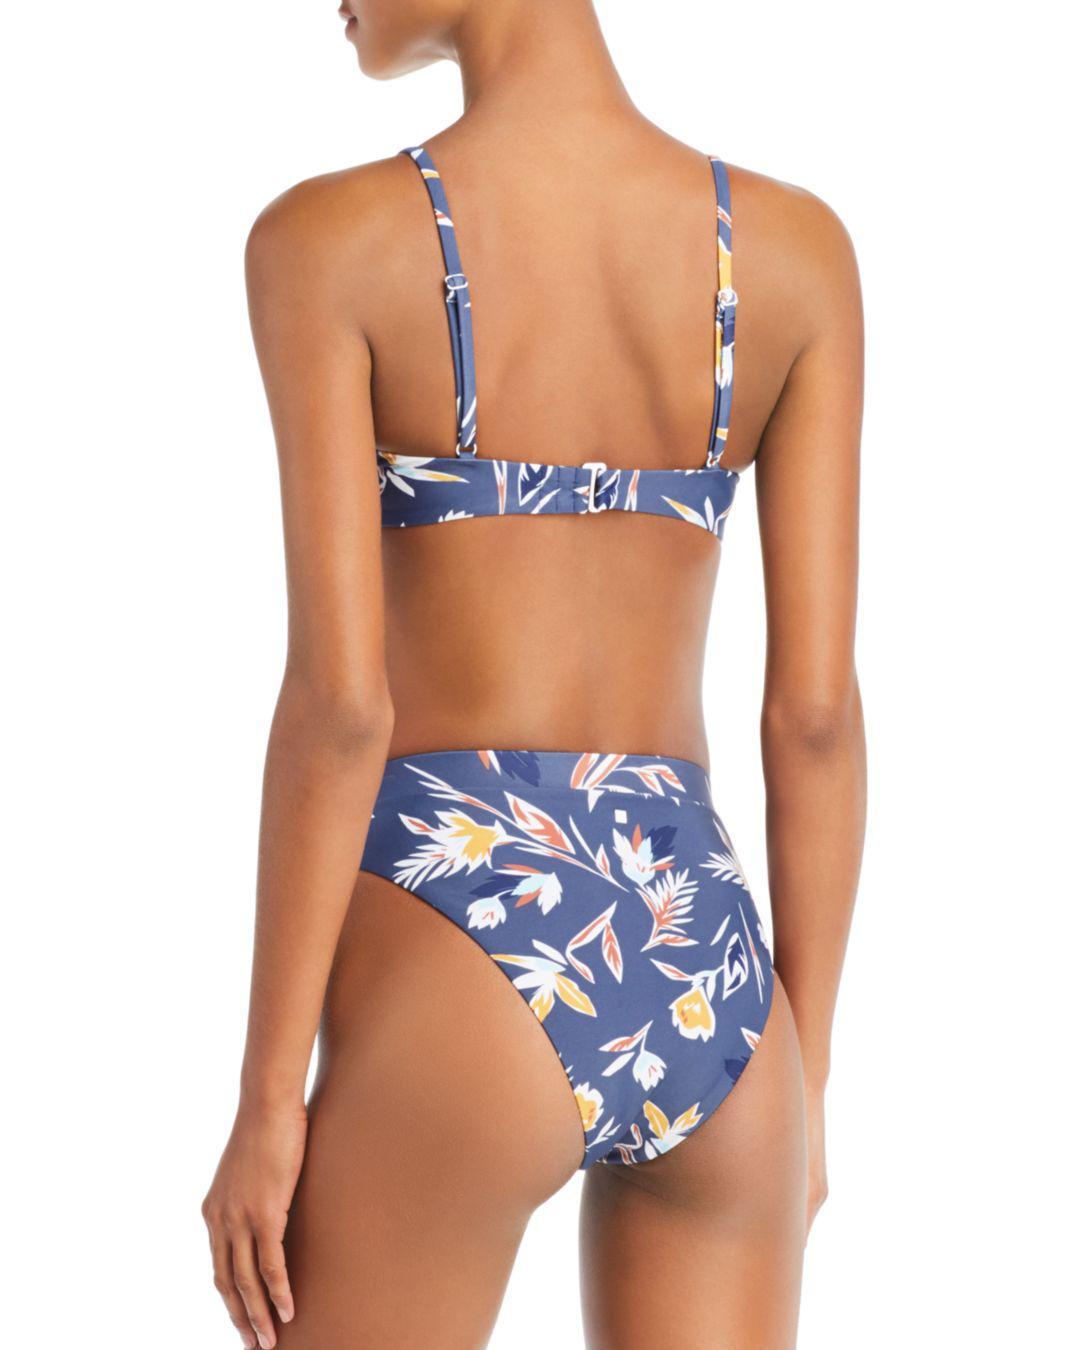 98df83b1d4f78 Lyst - Dolce Vita Matisse Floral High Waist Bikini Bottom in Blue